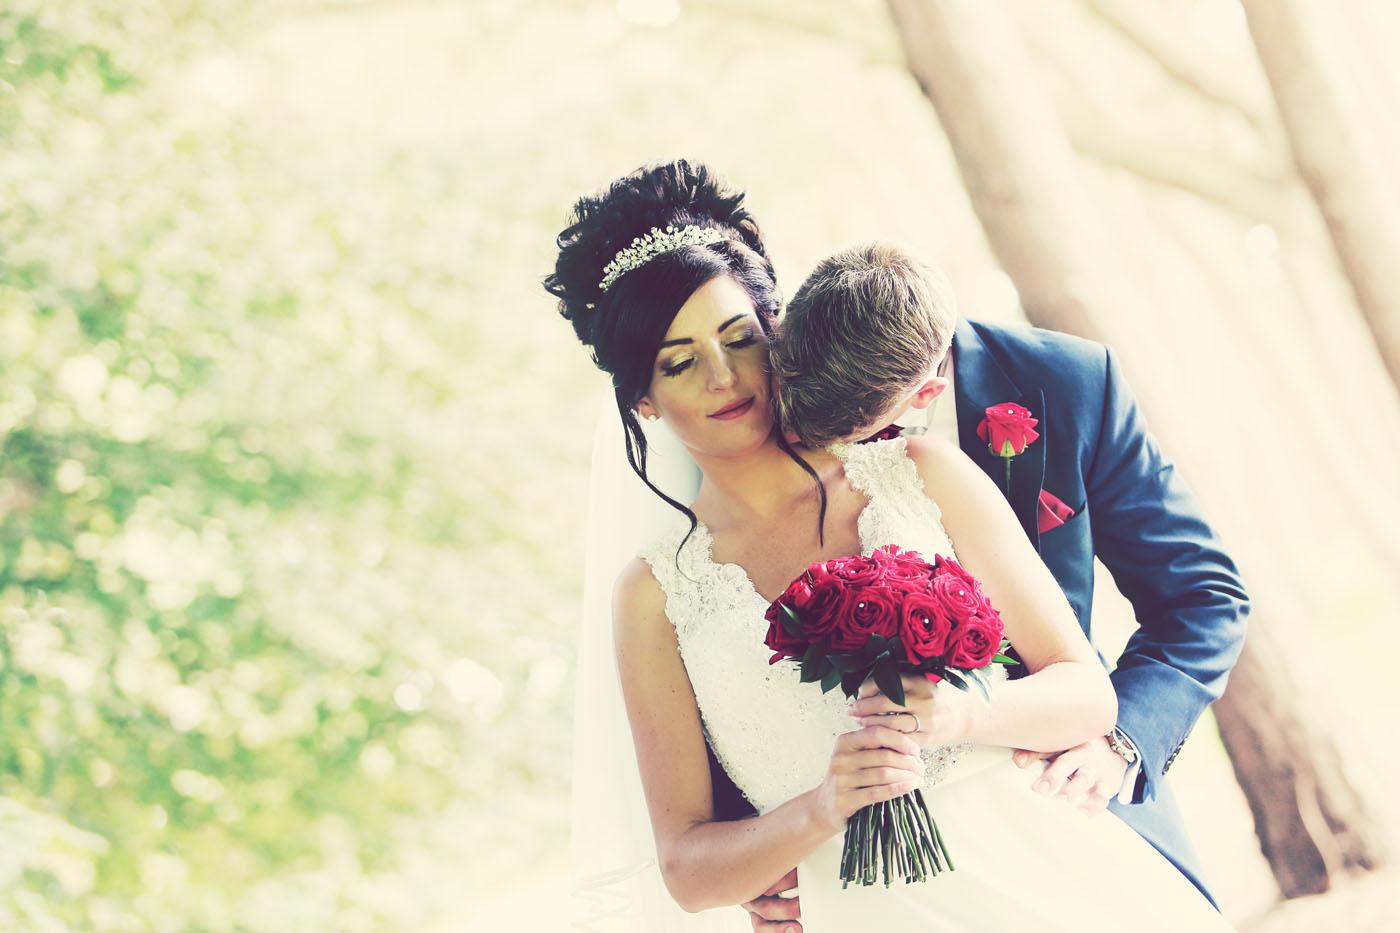 groom kissing bride on neck